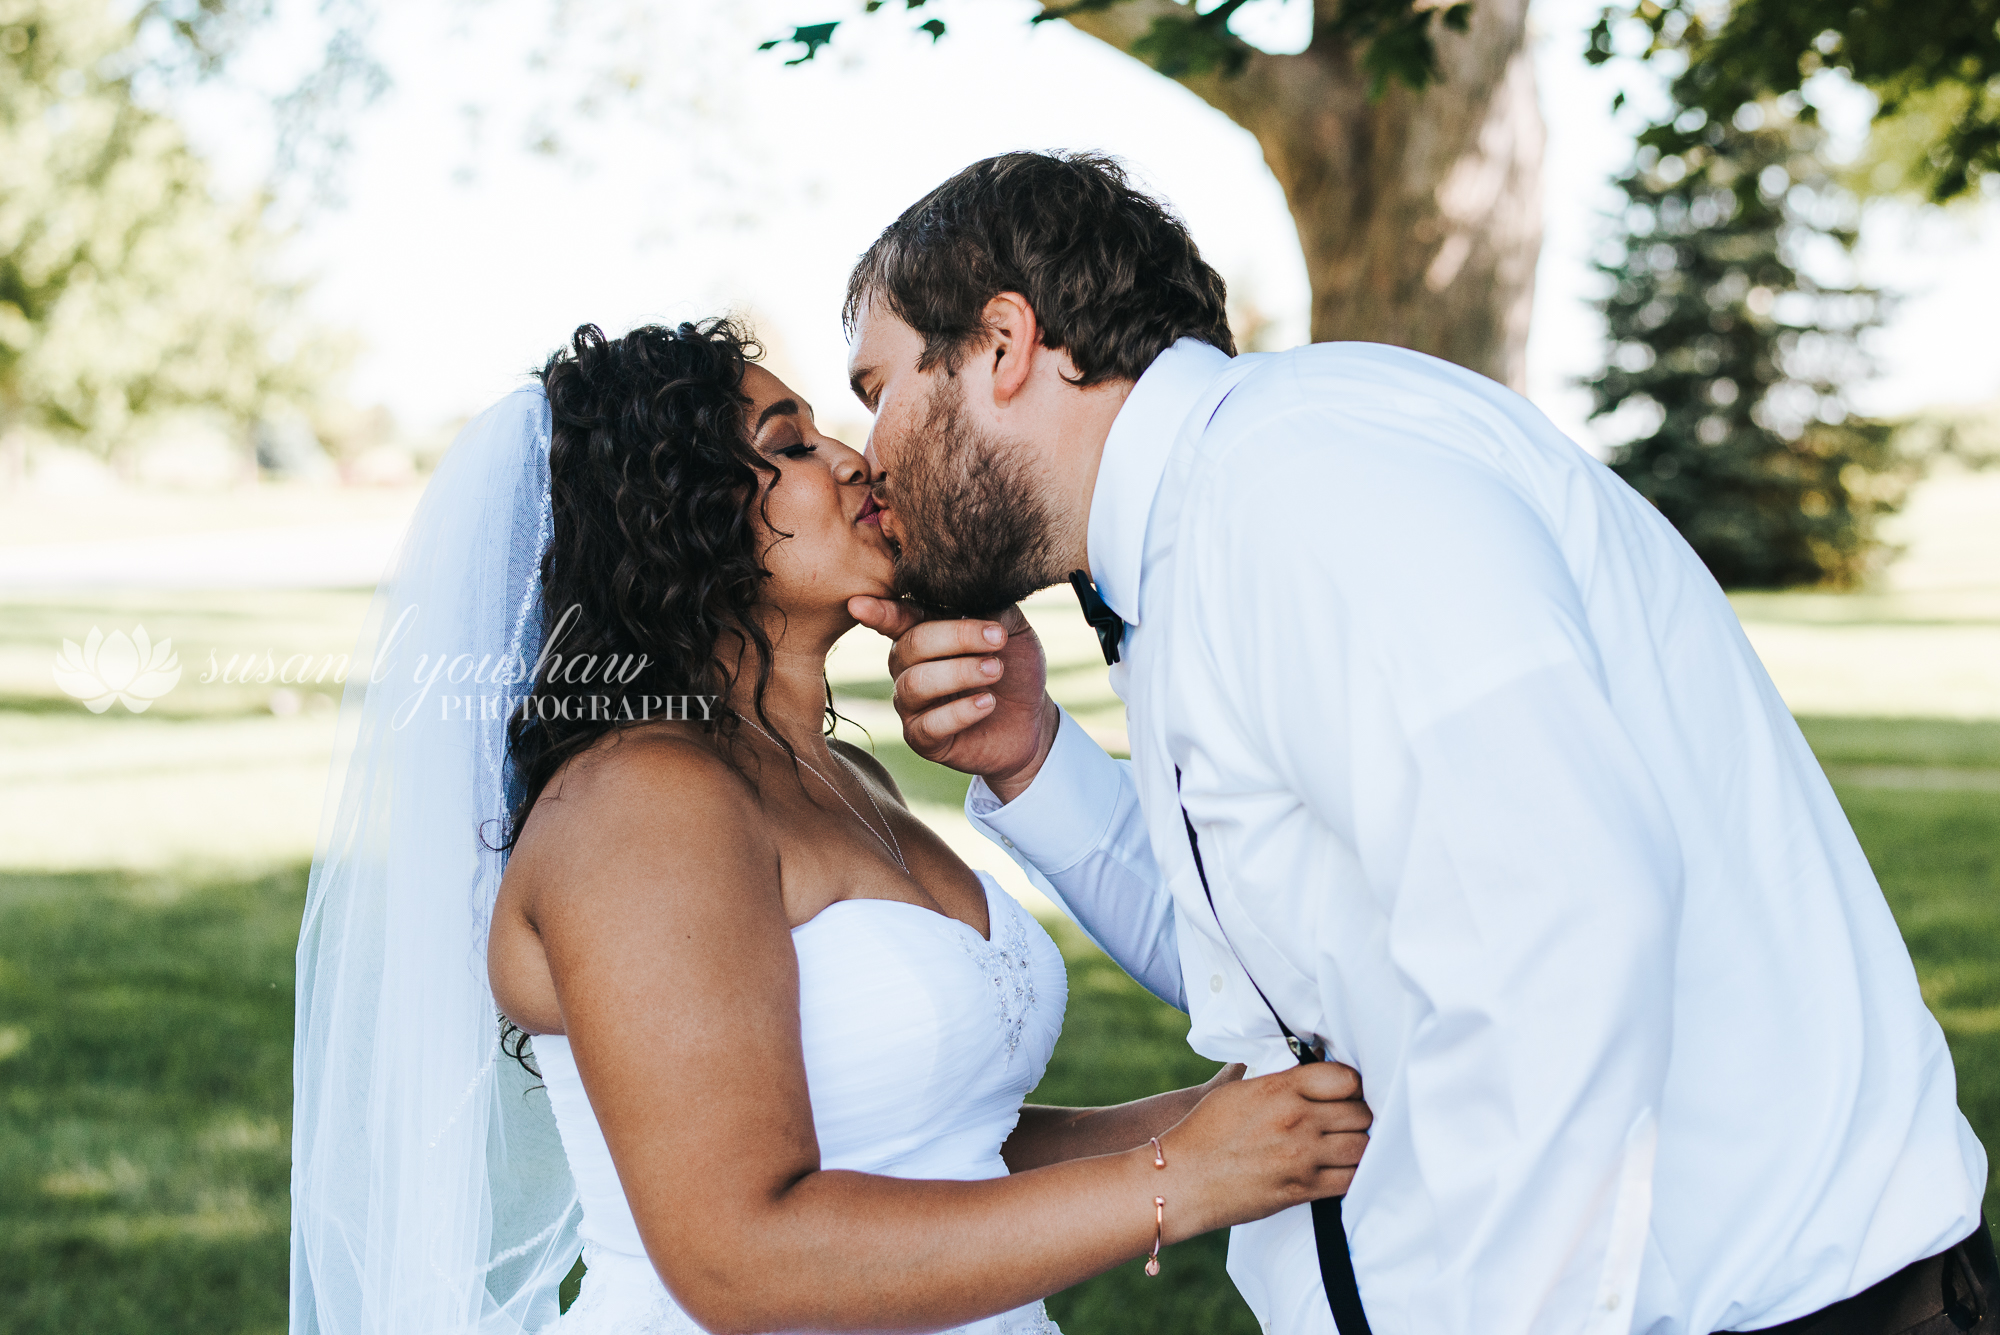 Katelyn and Wes Wedding Photos 07-13-2019 SLY Photography-103.jpg